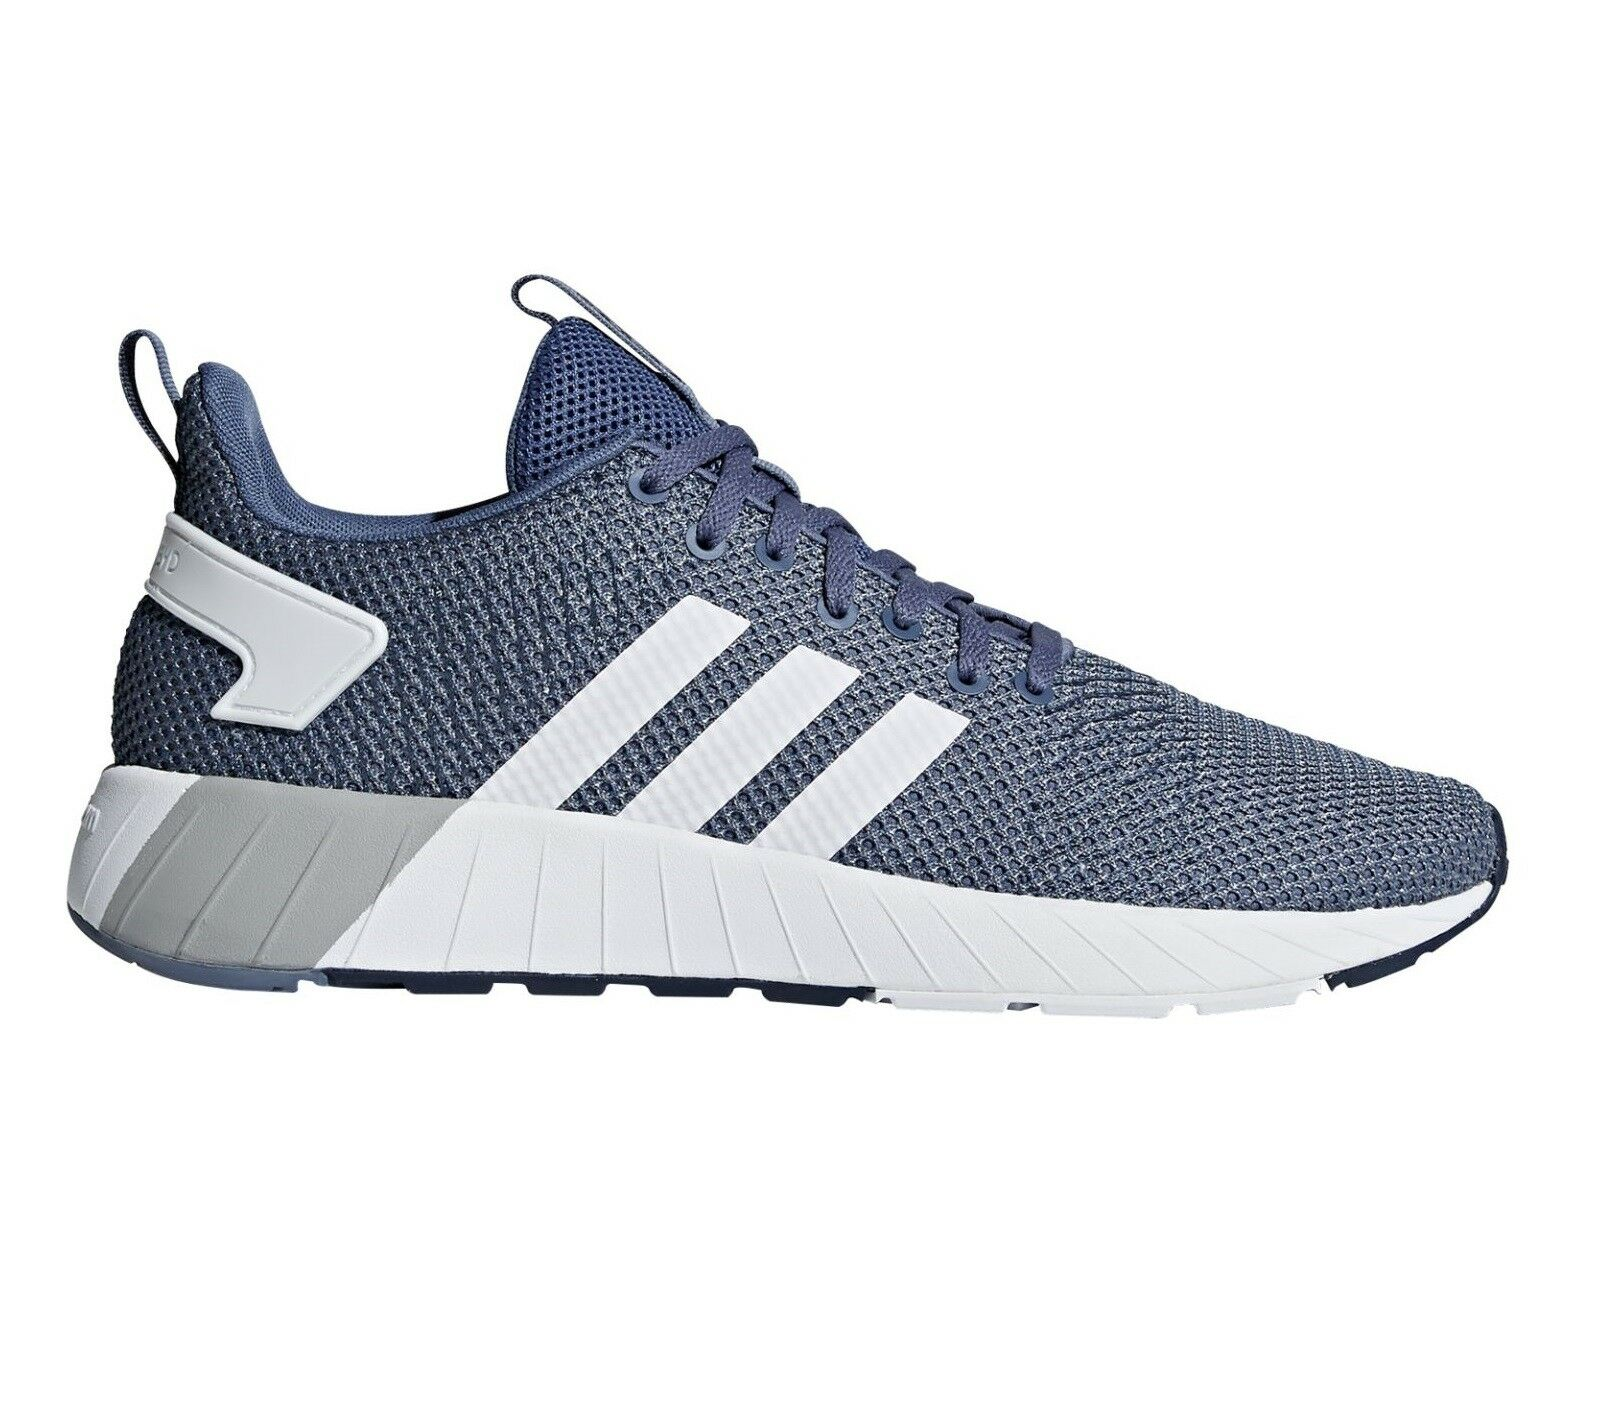 Adidas Questar BYD Herren Laufen schuhe-NEW-b44812